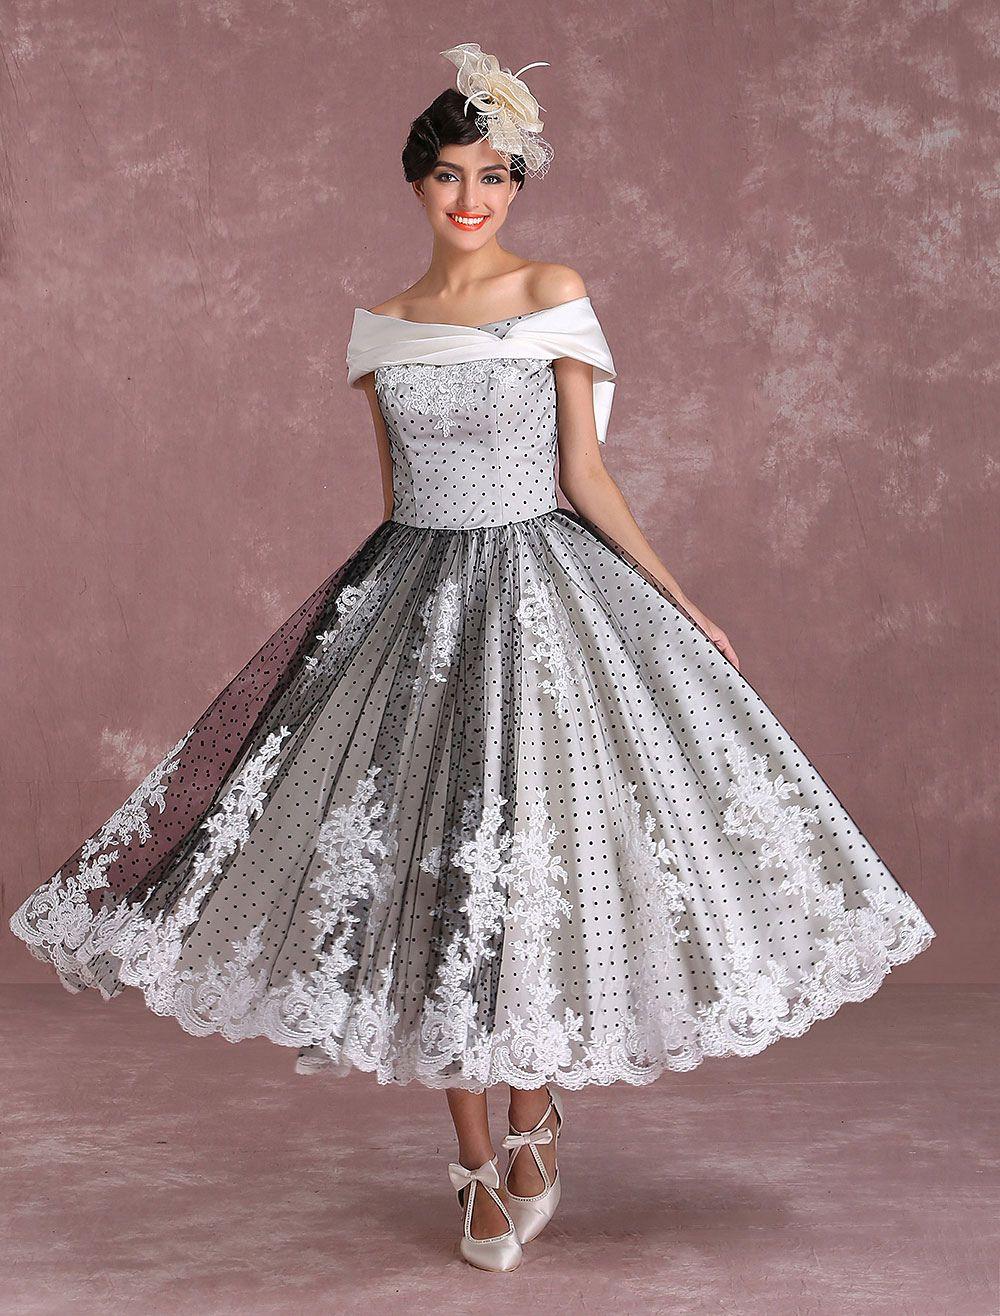 Black Wedding Dresses Vintage Short Bridal Gown Lace Off The Shoulder Polka Dot Print Bridal Dress With Bow At Back Exclusive